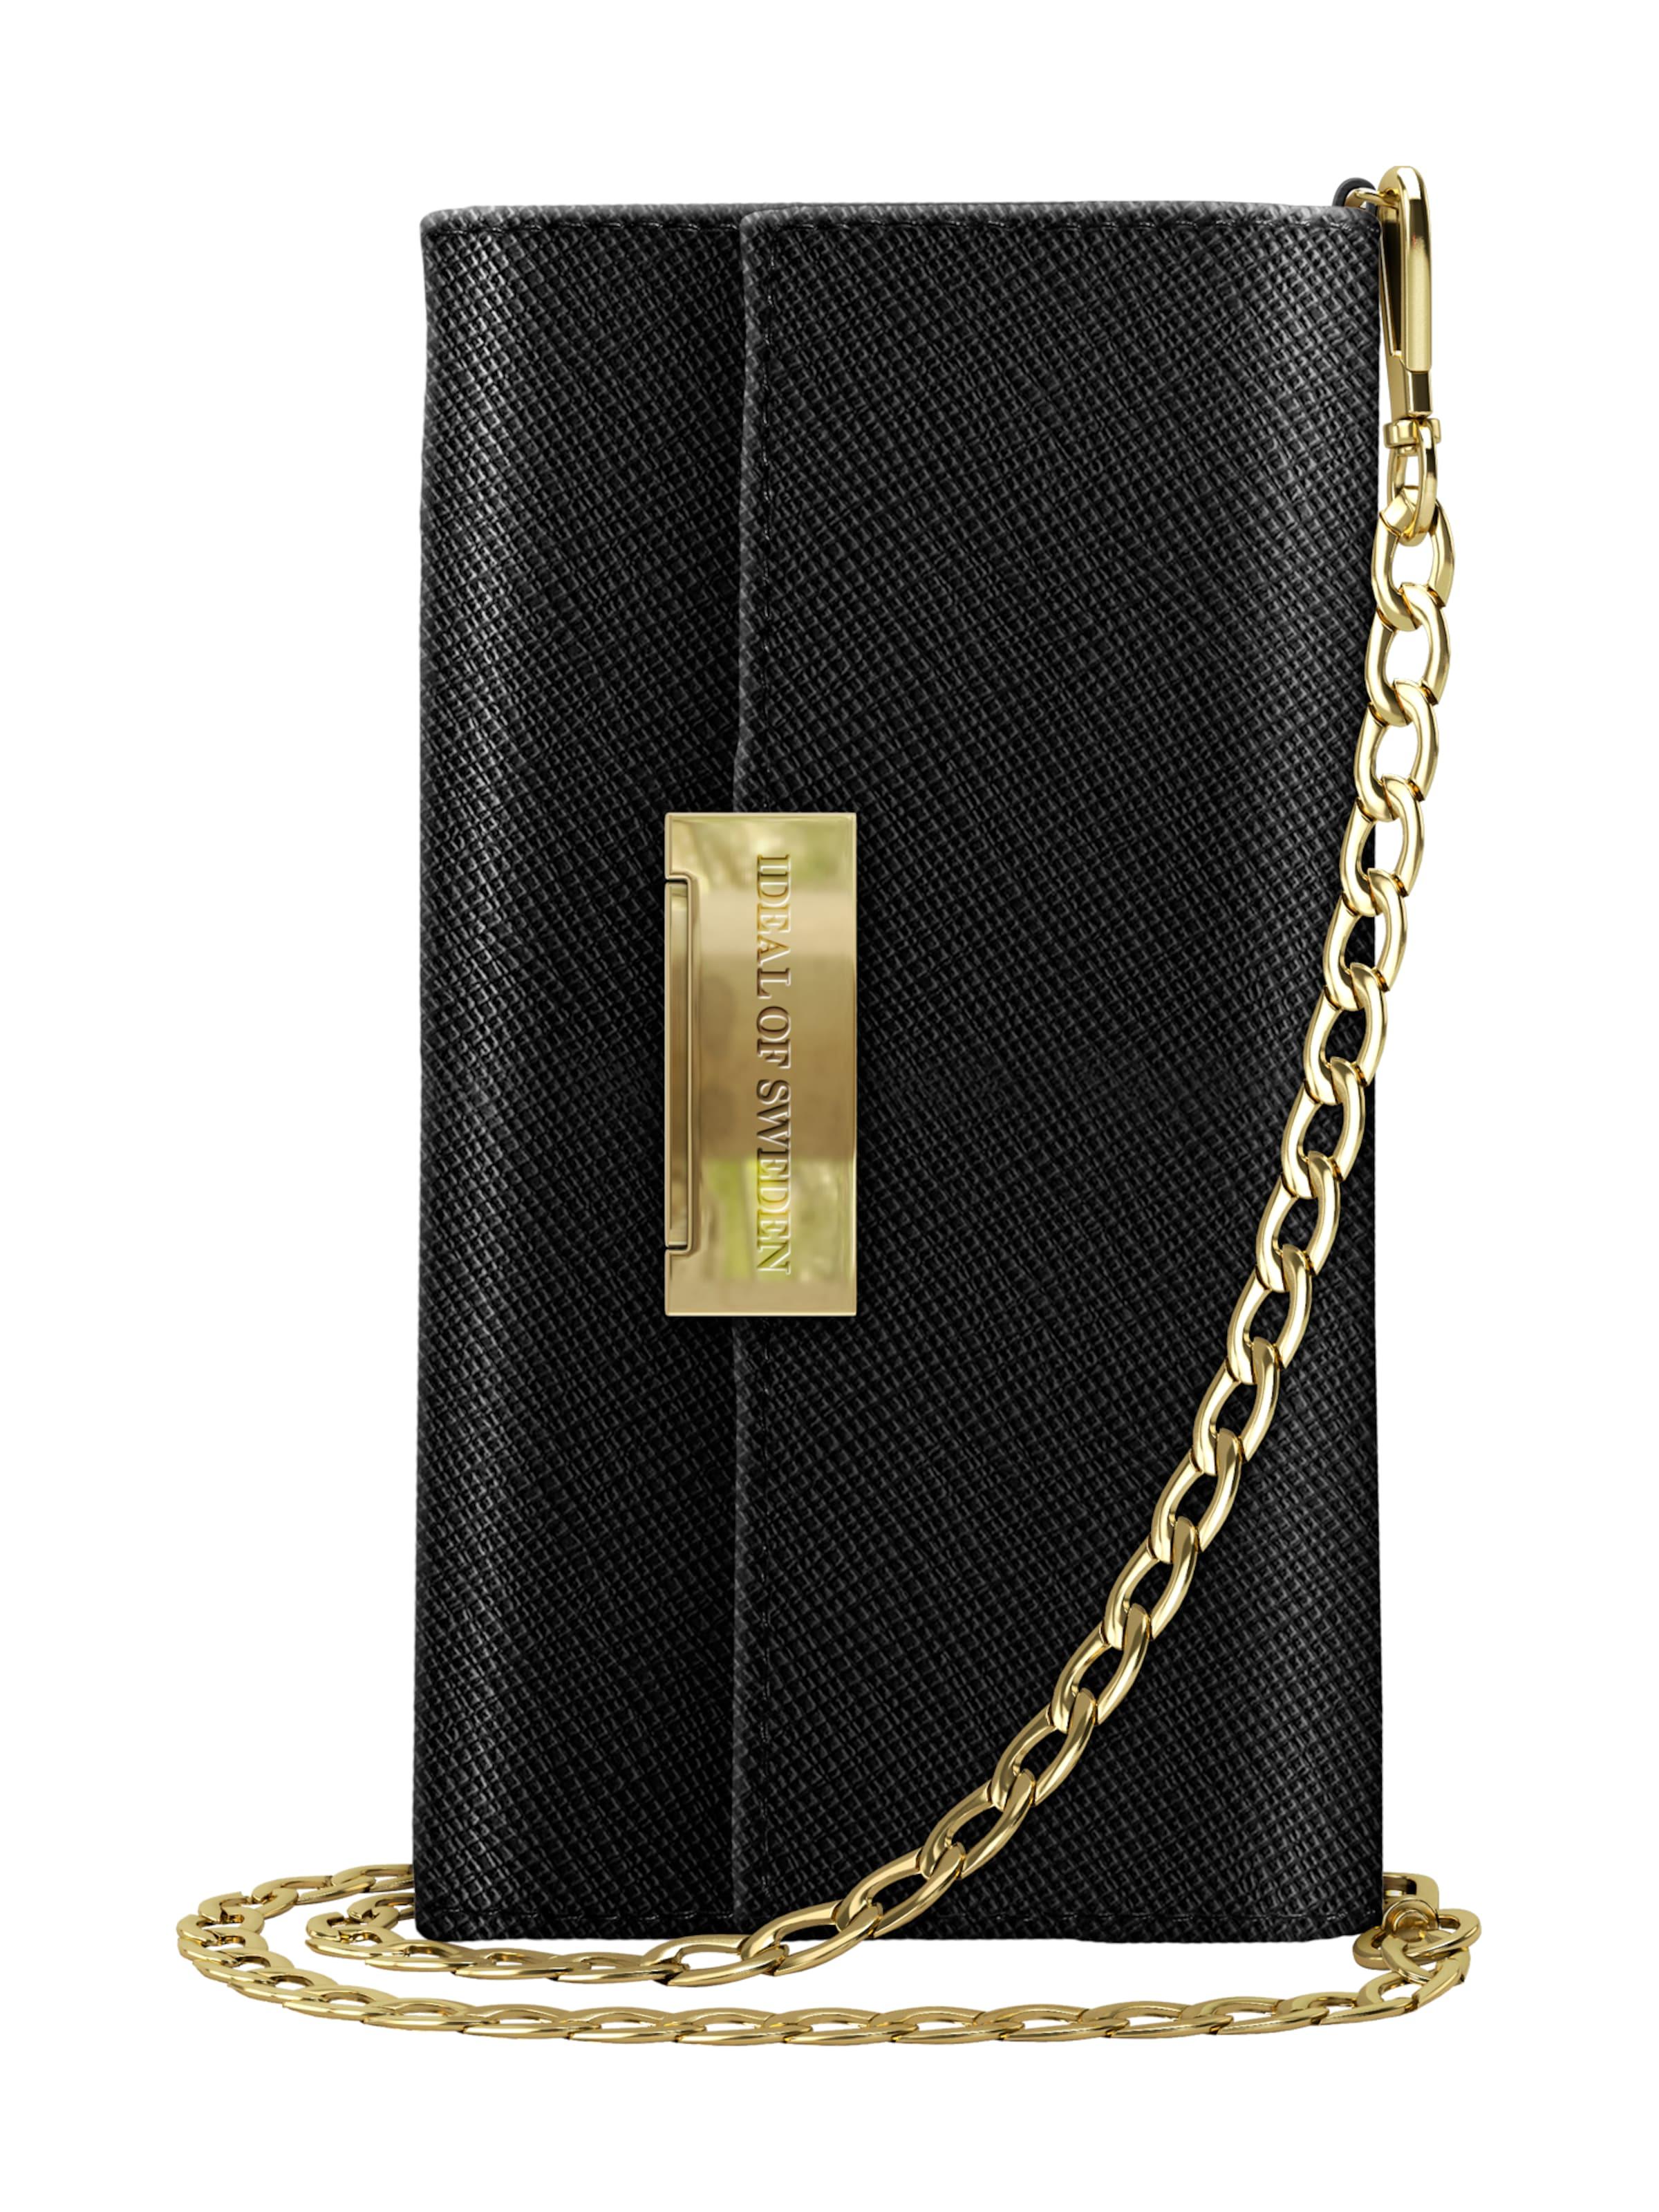 Ideal Pour Of Sweden Smartphone En Protection Noir b7gyIY6fv